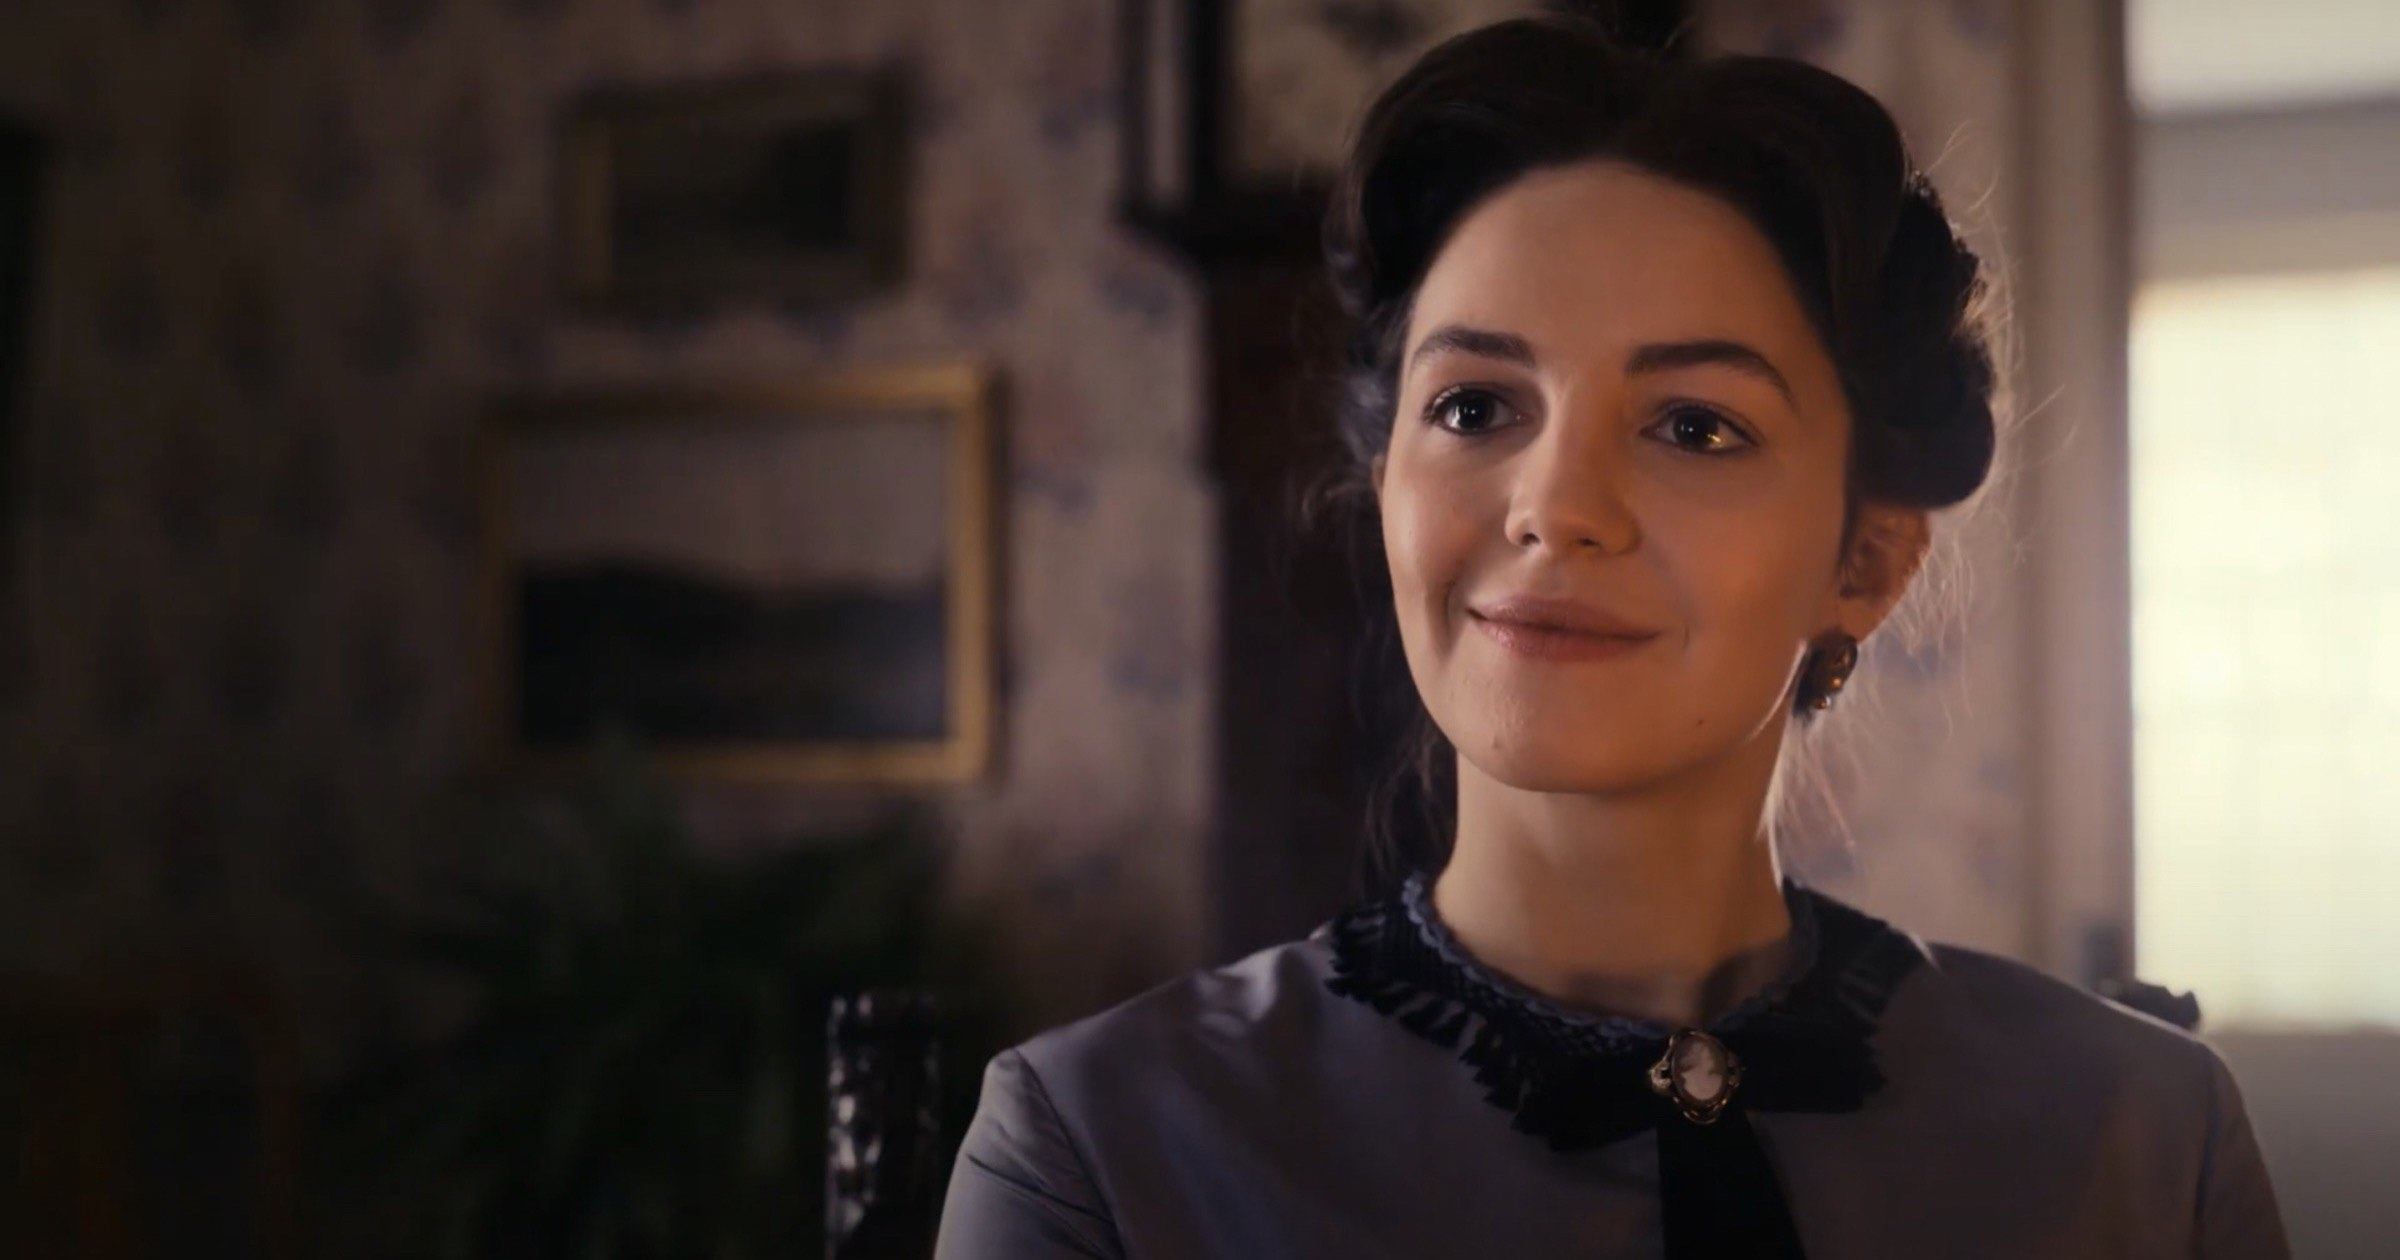 Image from 'Dickinson' Season 2